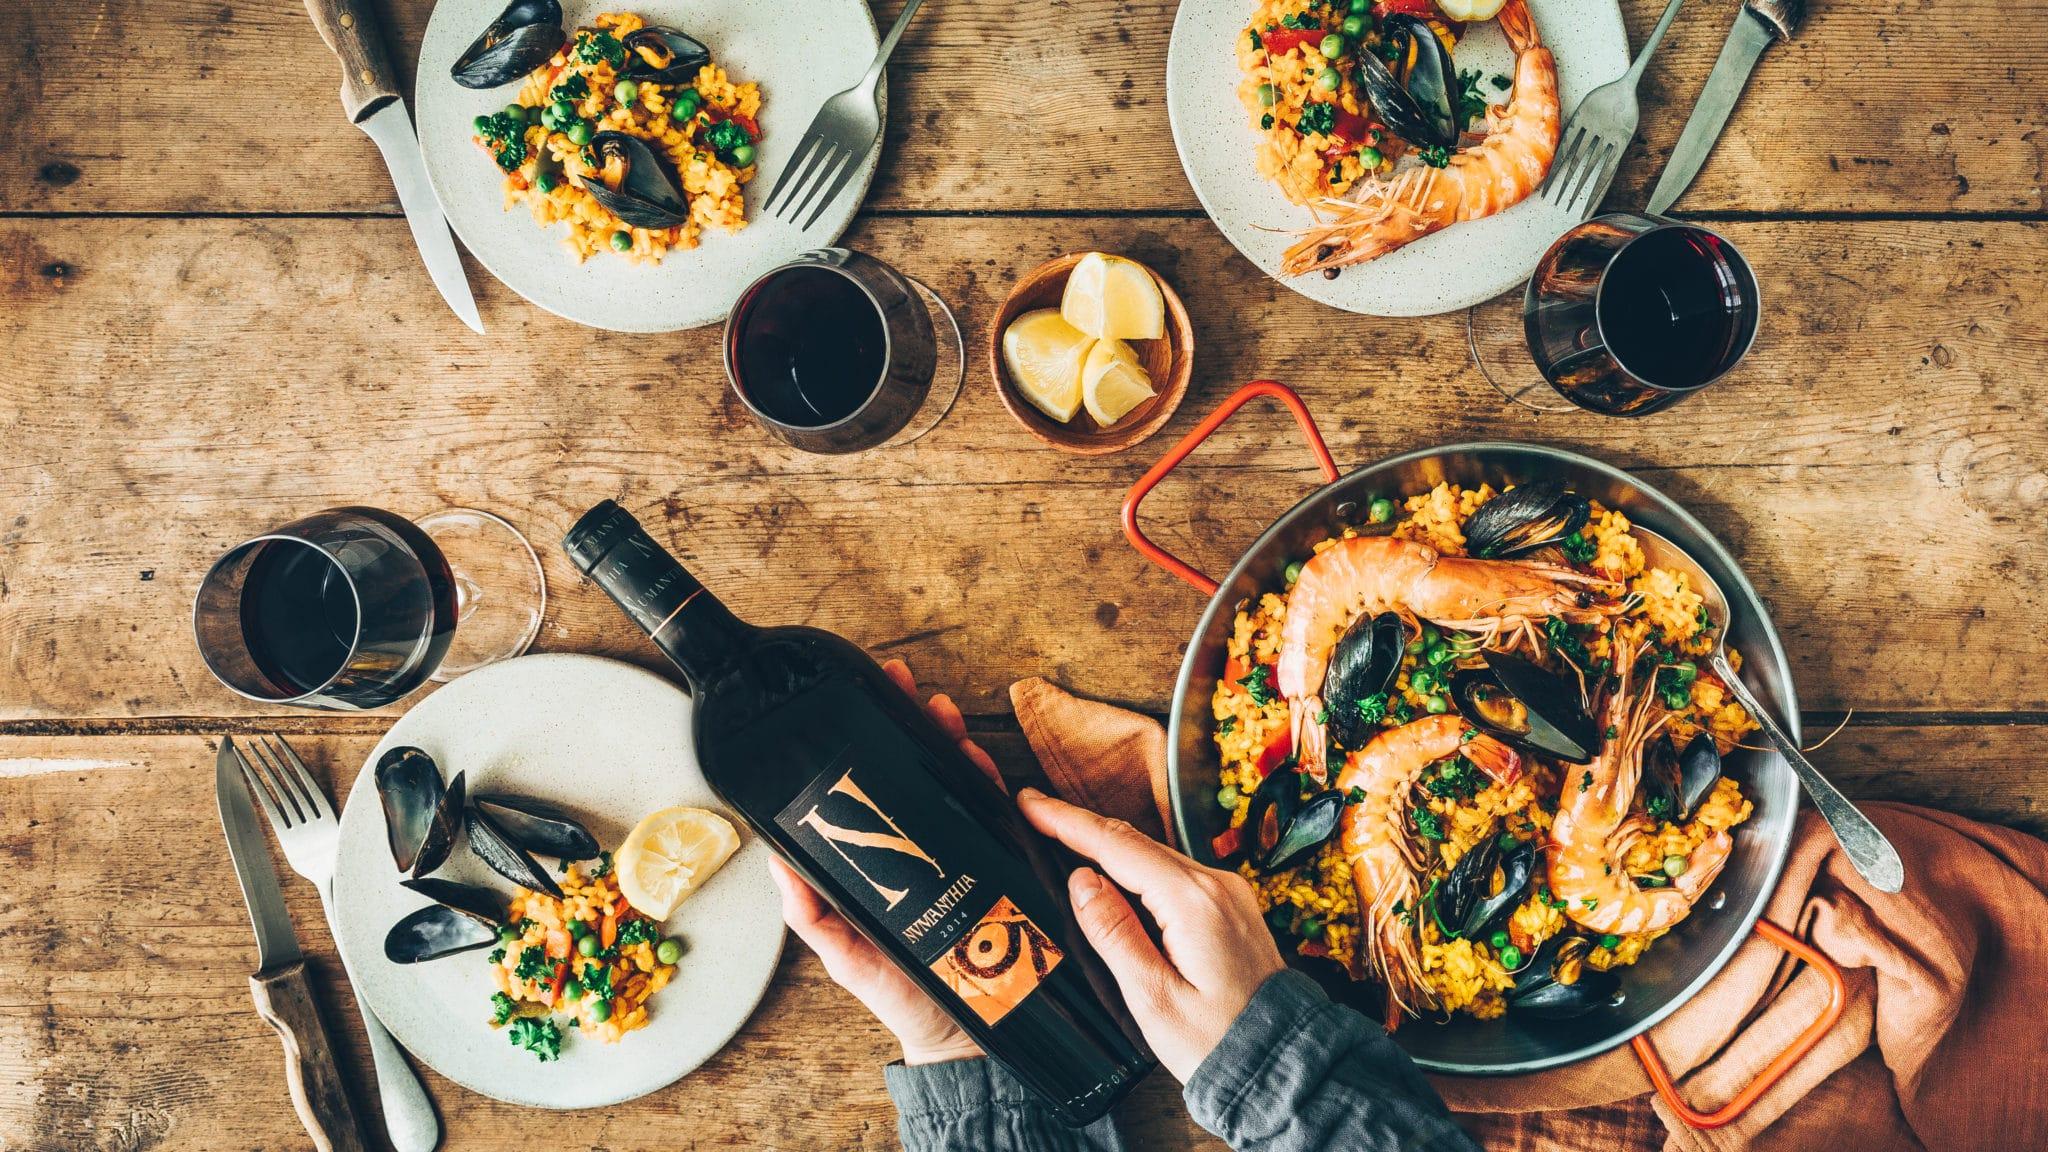 Styliste culinaire Lyon Bodega Numanthia - Mégane Arderighi